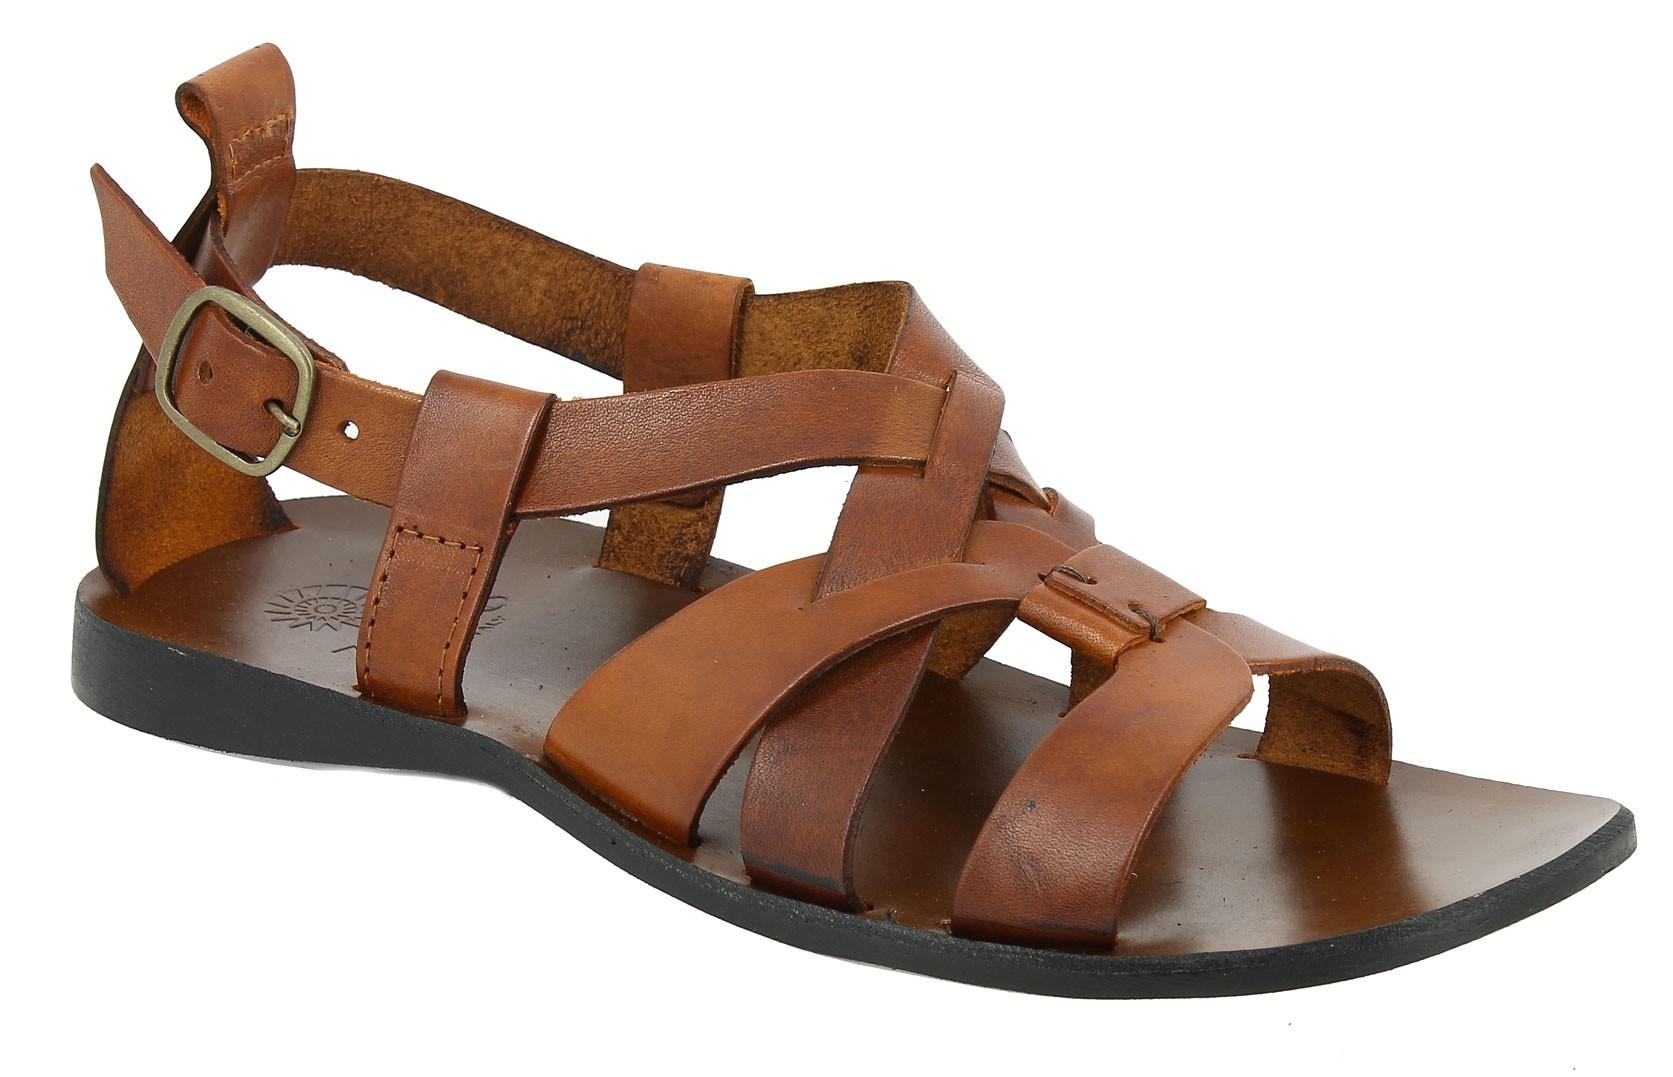 sandals zeus 1250 brown leather center 51